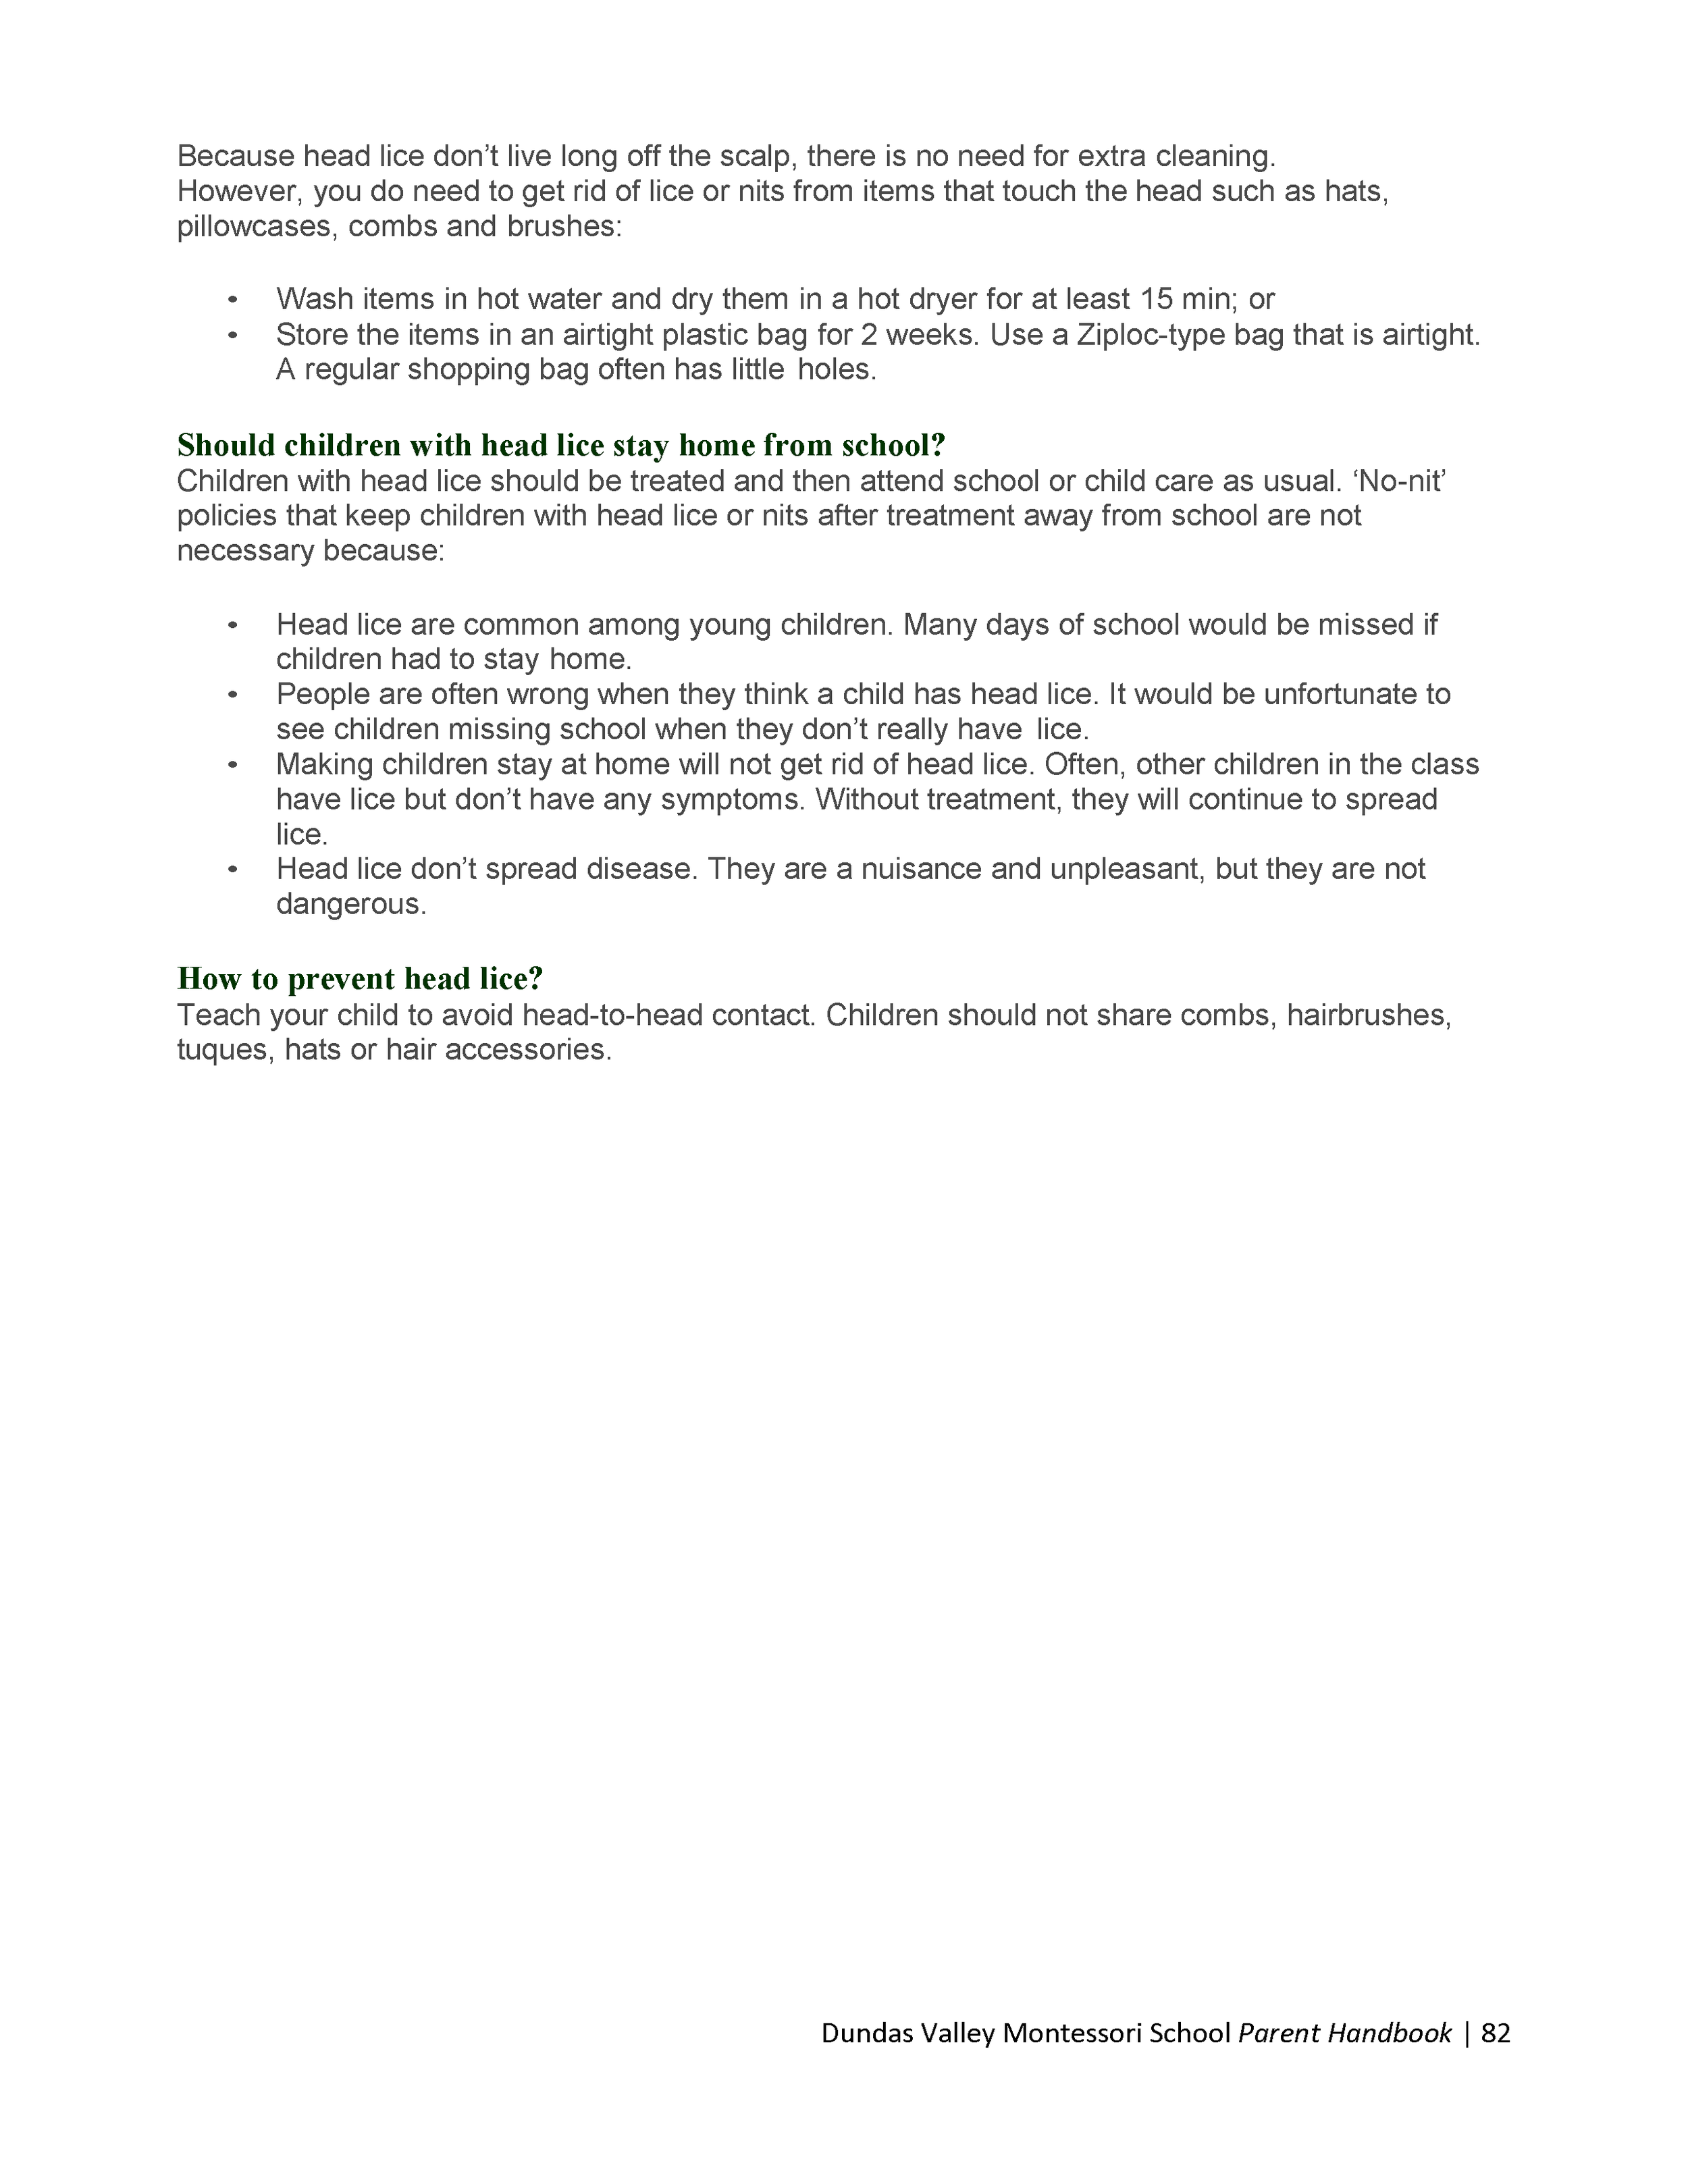 DVMS-Parent-Handbook-19-20_Page_084.png